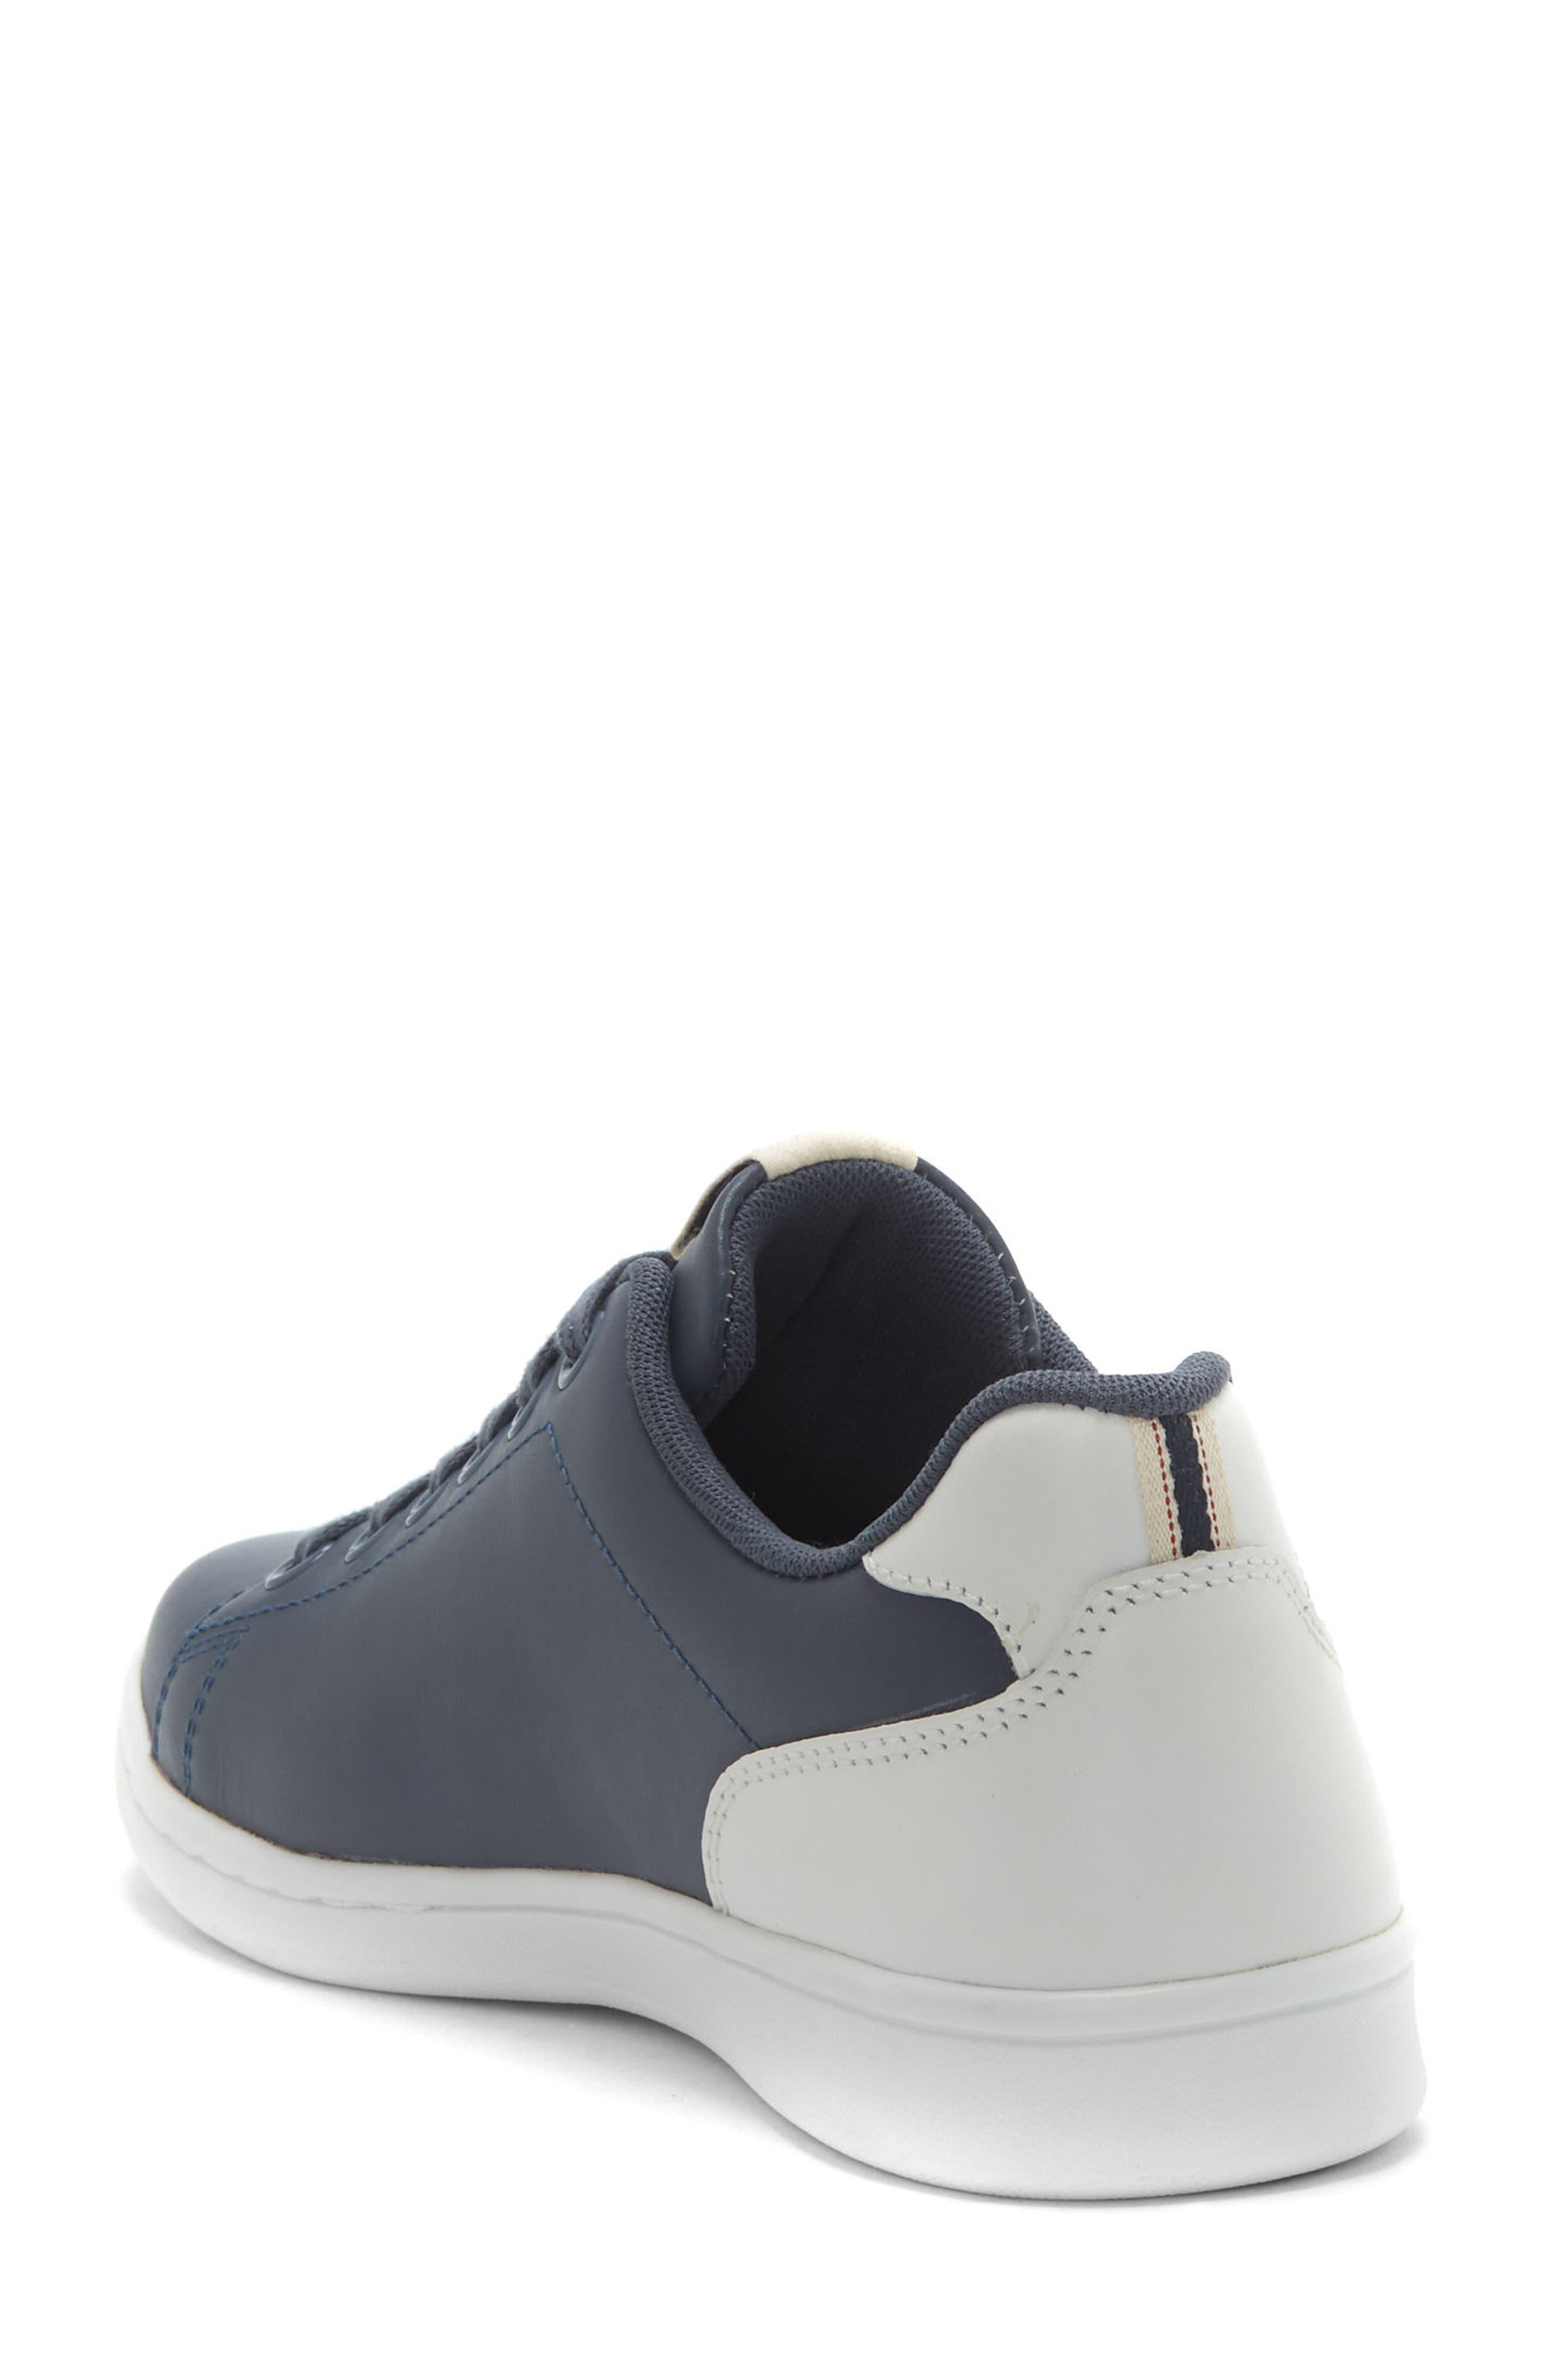 Chapanima Sneaker,                             Alternate thumbnail 4, color,